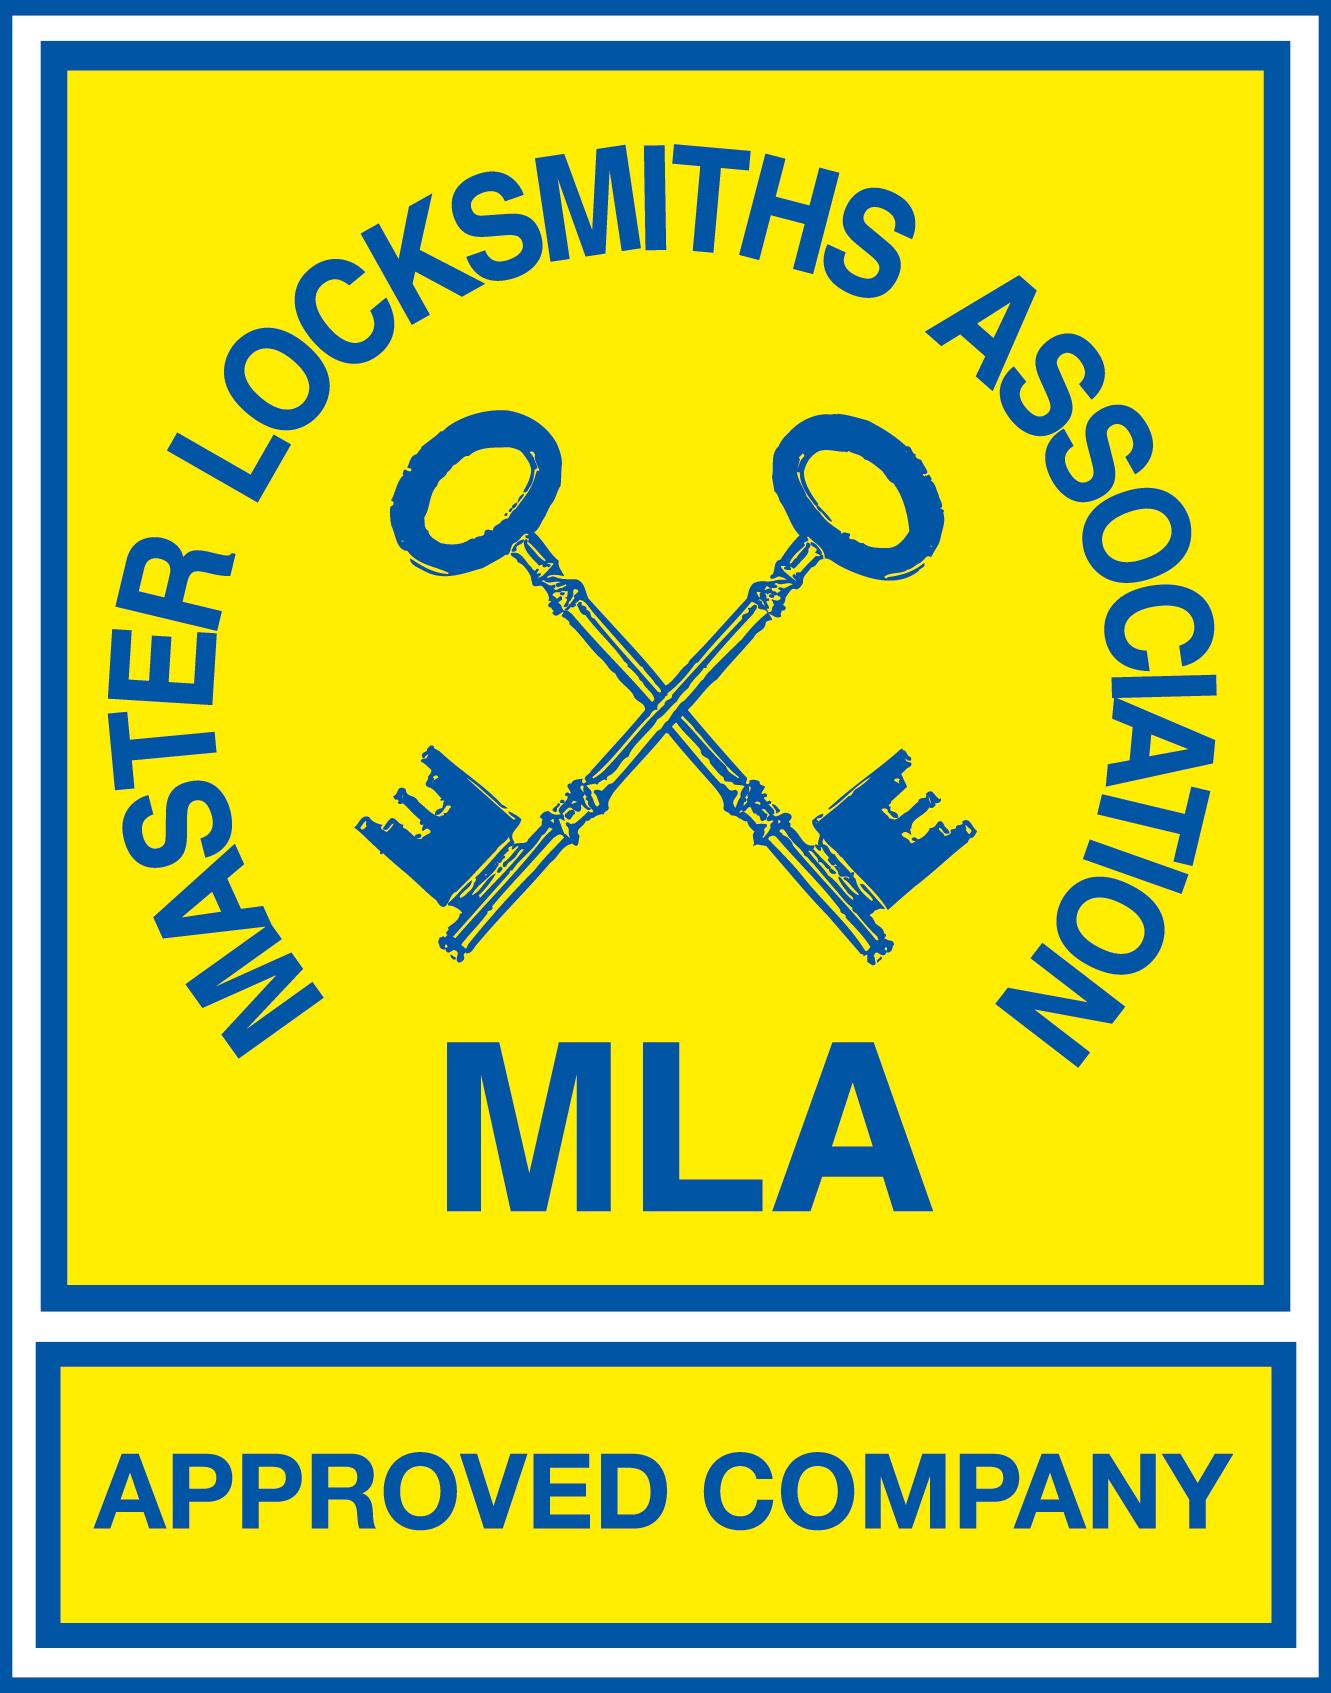 MLA APPROVED COMPANY LOGO